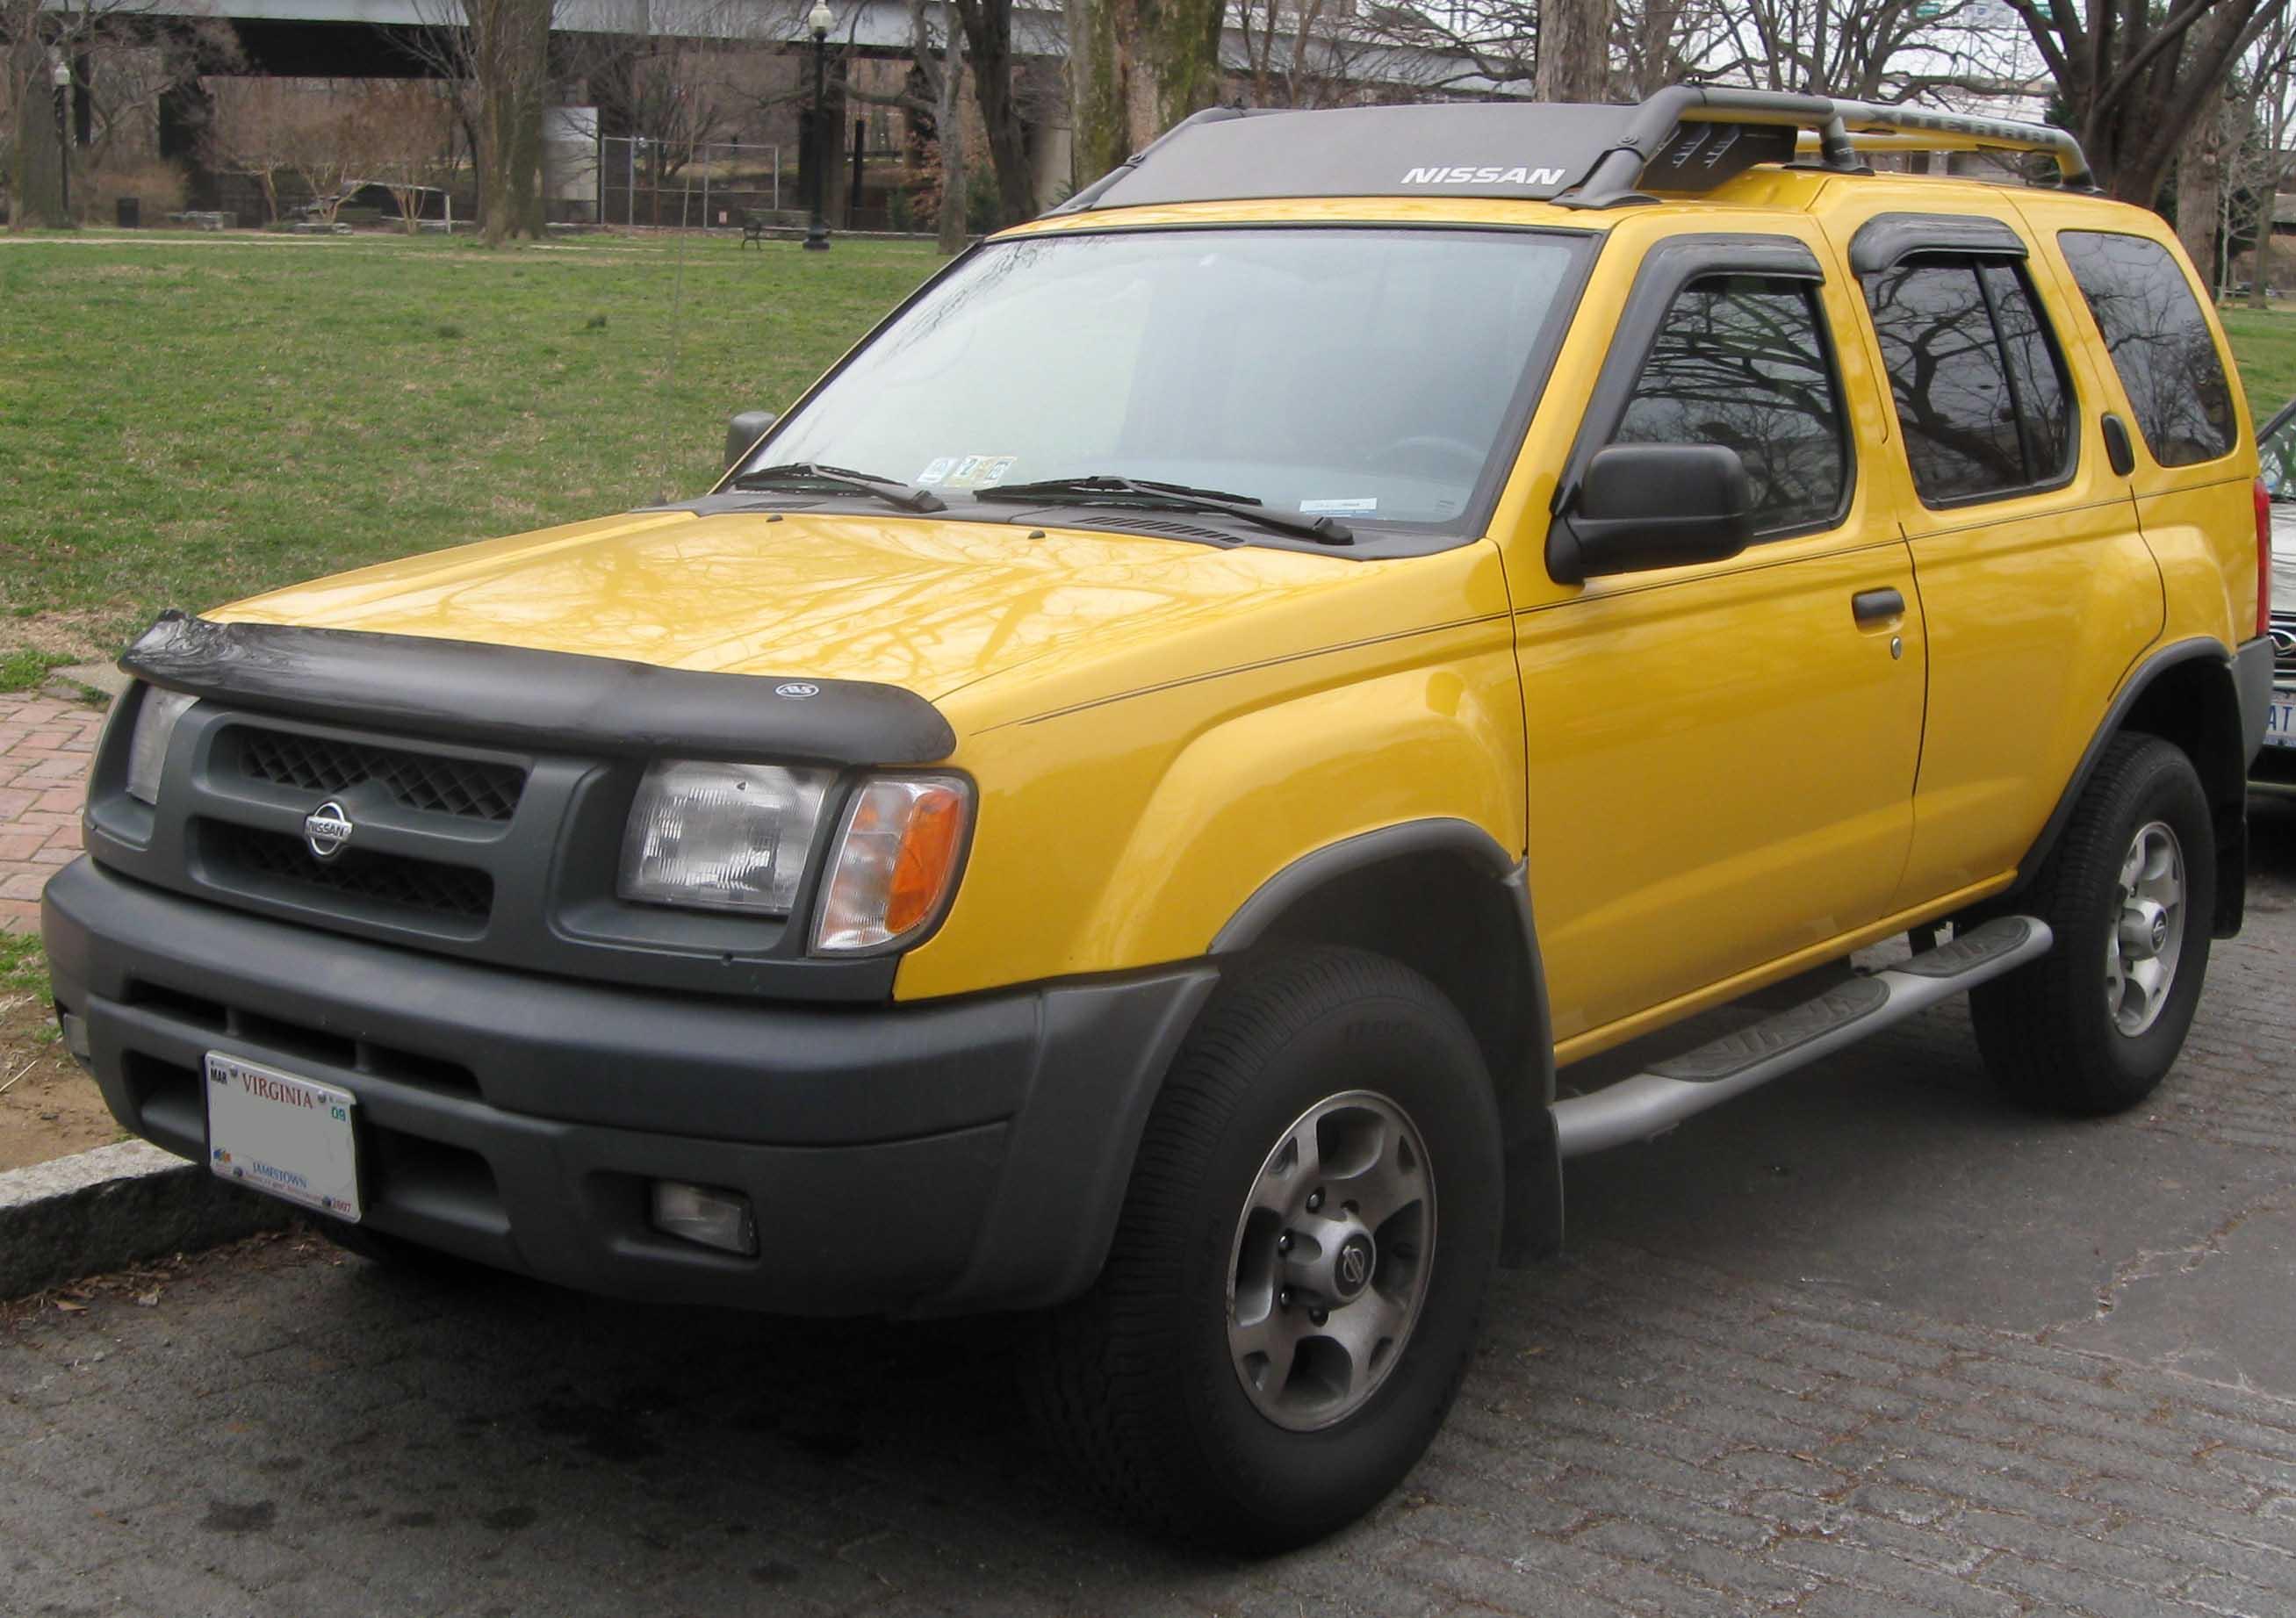 File 2000-2001 Nissan Xterra Jpg